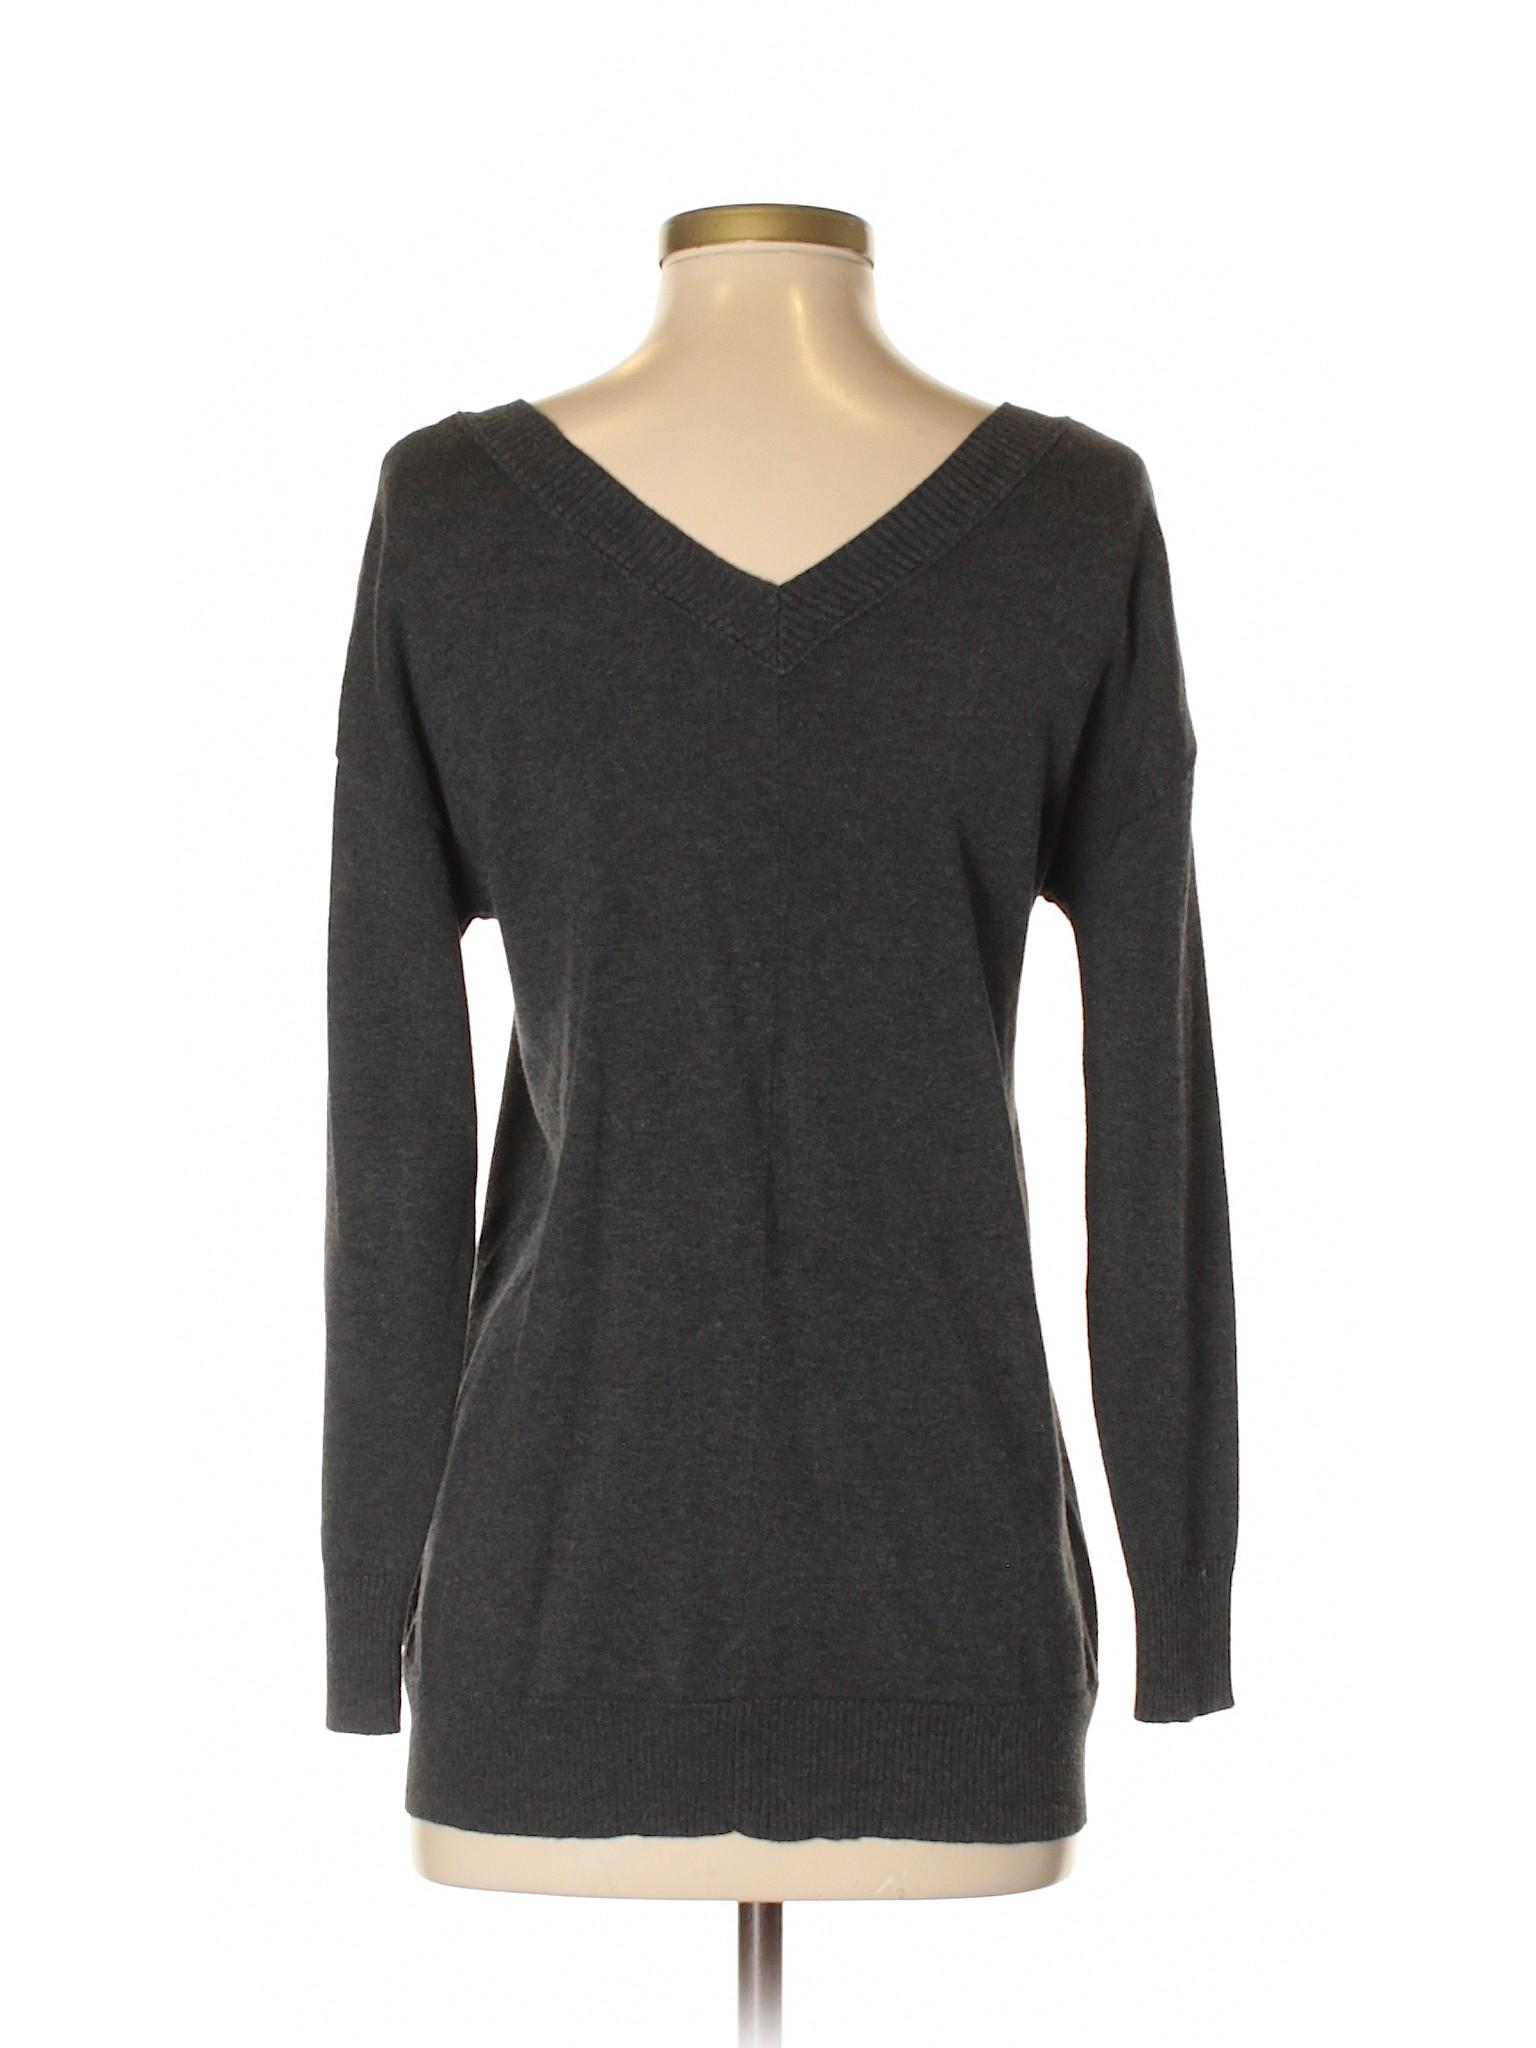 Caslon Sweater Boutique Pullover Sweater Pullover Boutique Pullover Sweater Boutique Pullover Caslon Caslon Boutique Caslon aESRgwq